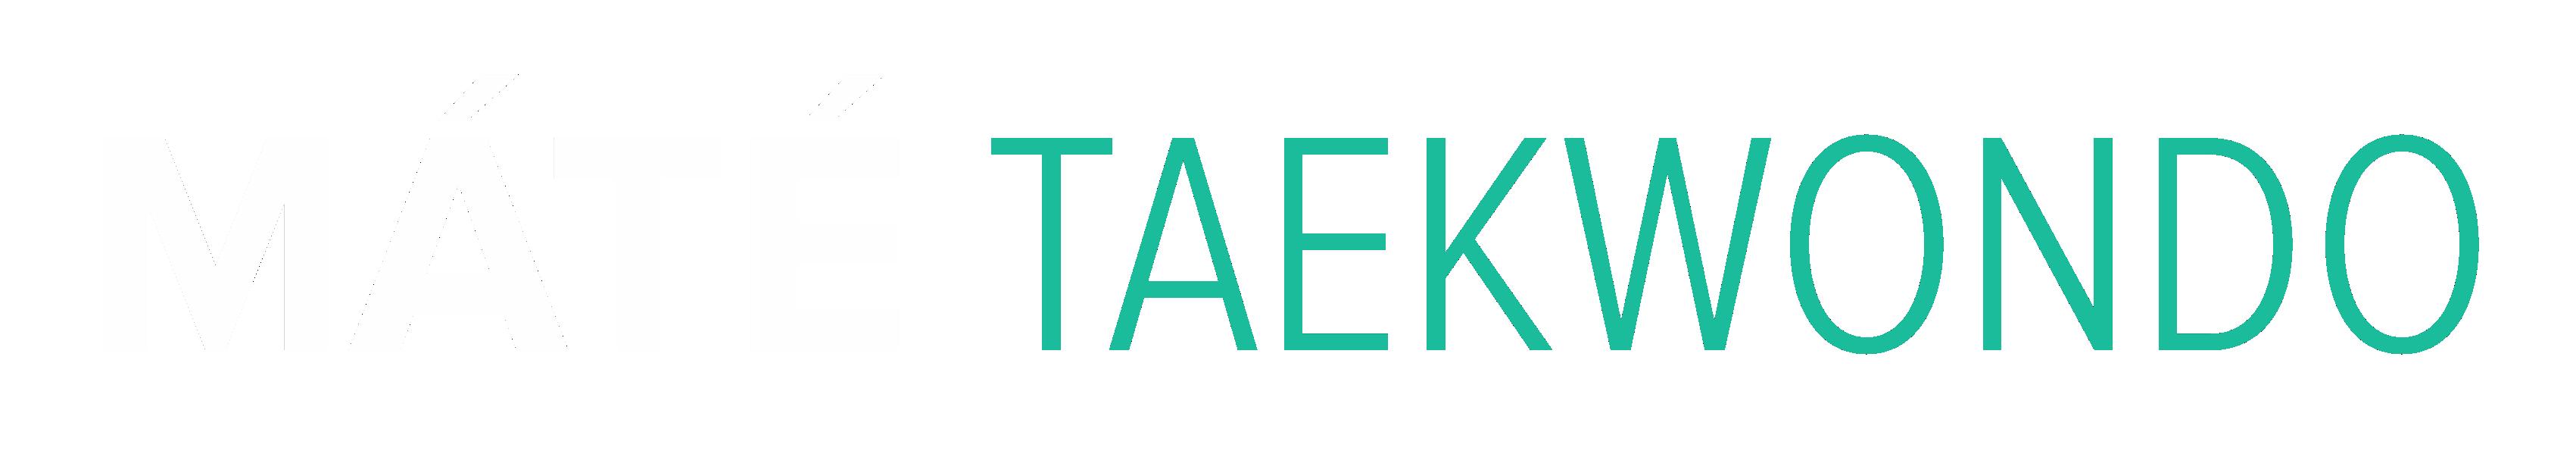 Mate taekwondo logo